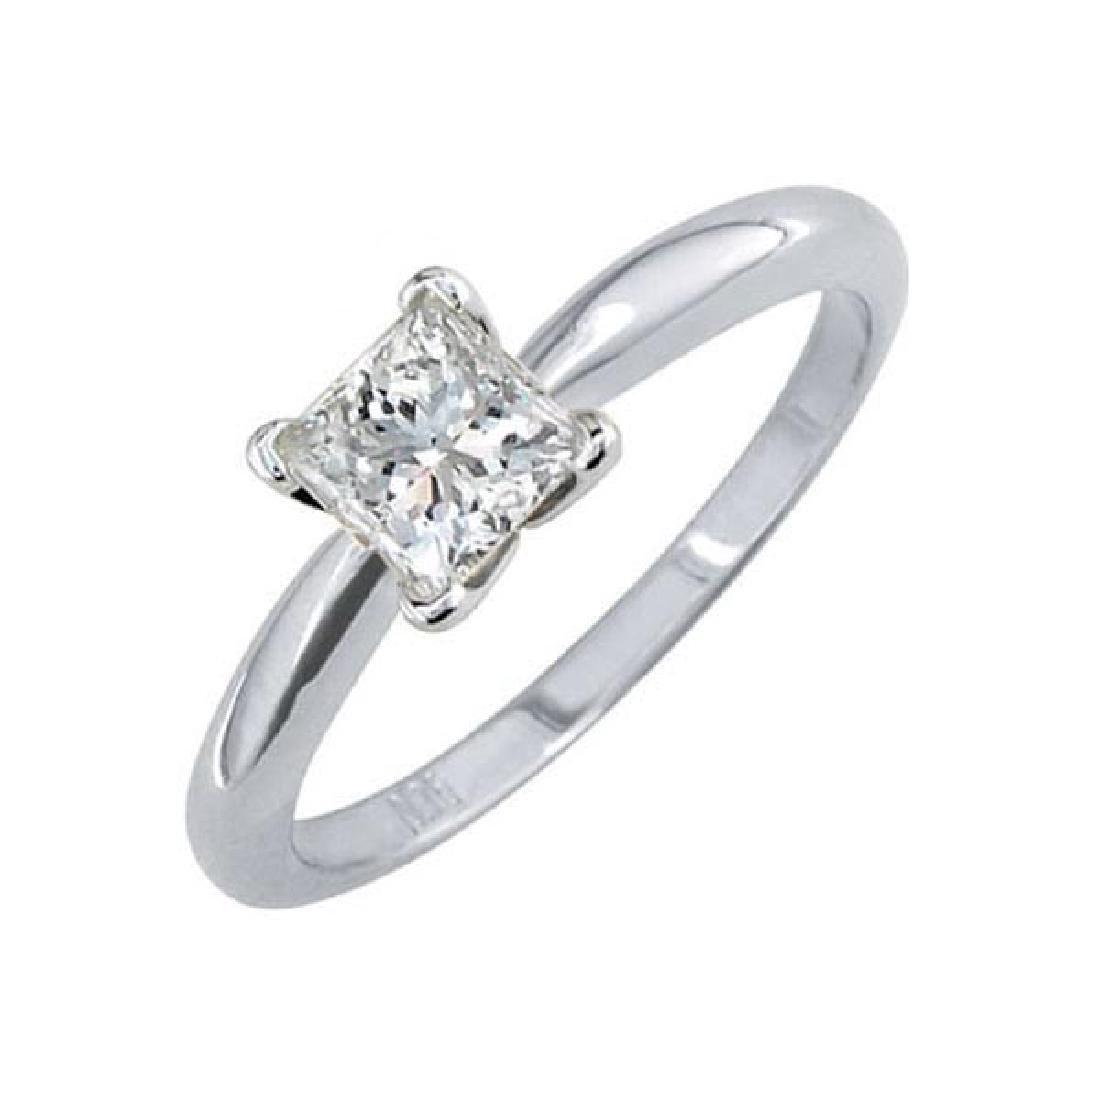 Certified 1.5 CTW Princess Diamond Solitaire 14k Ring D